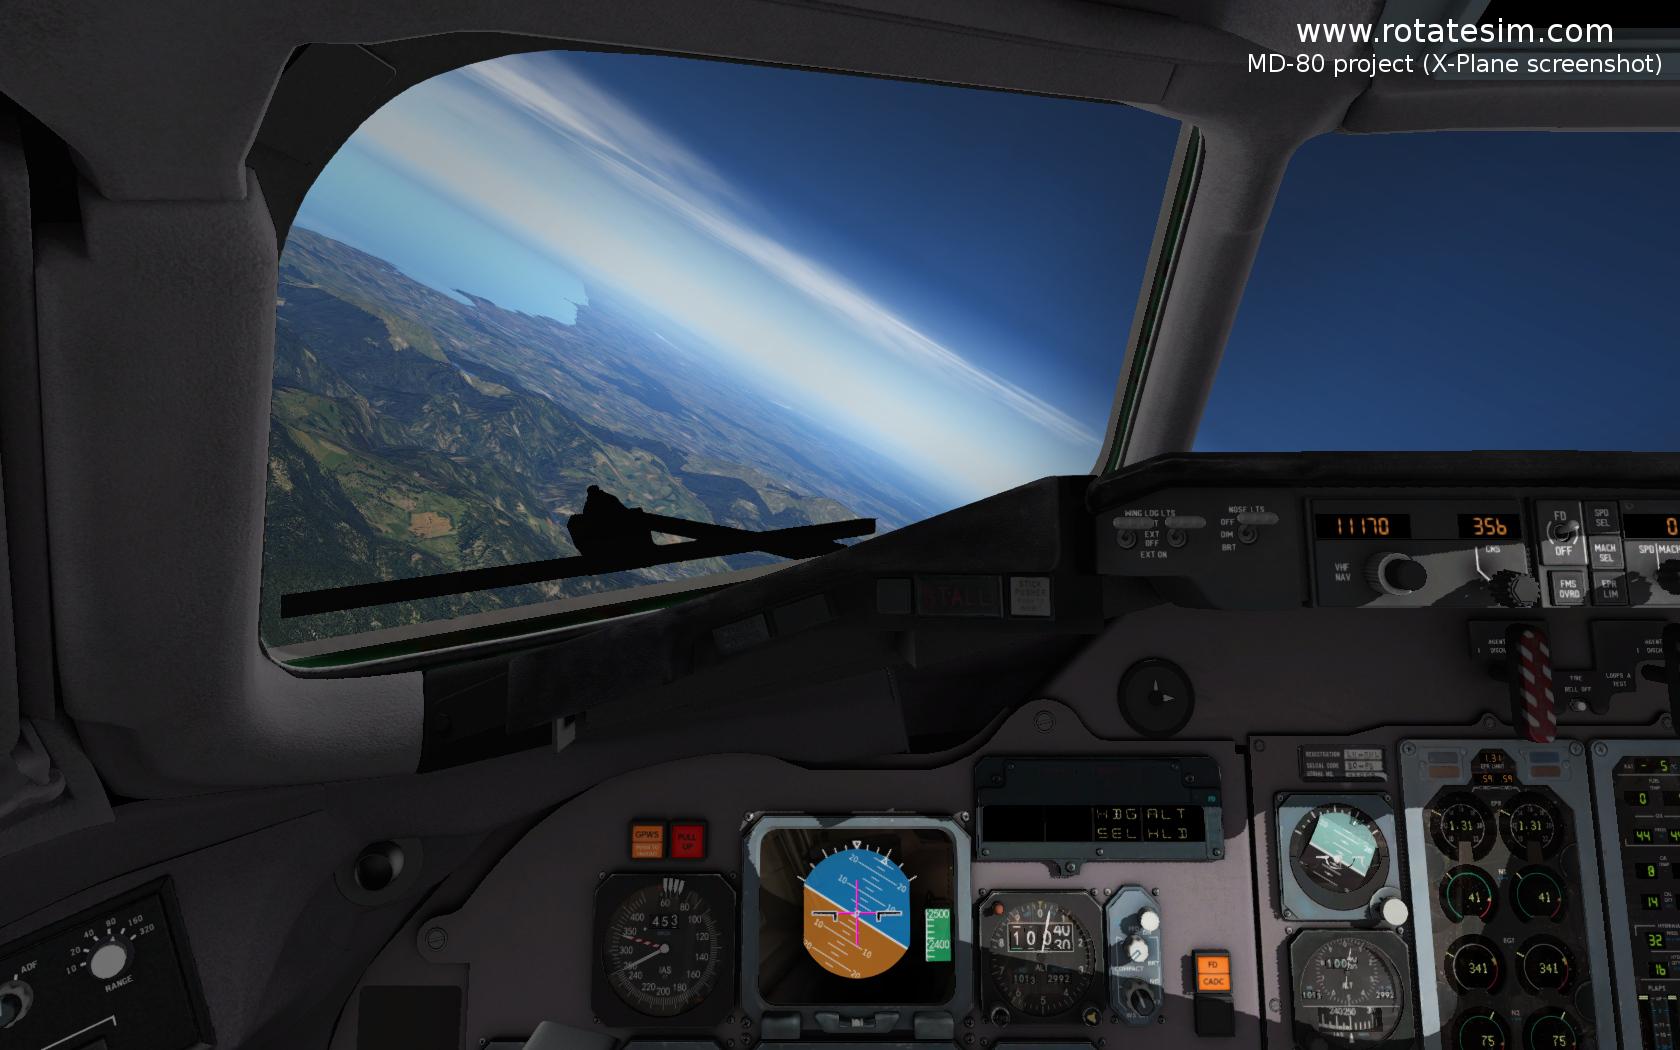 MD-80 screenshot 09